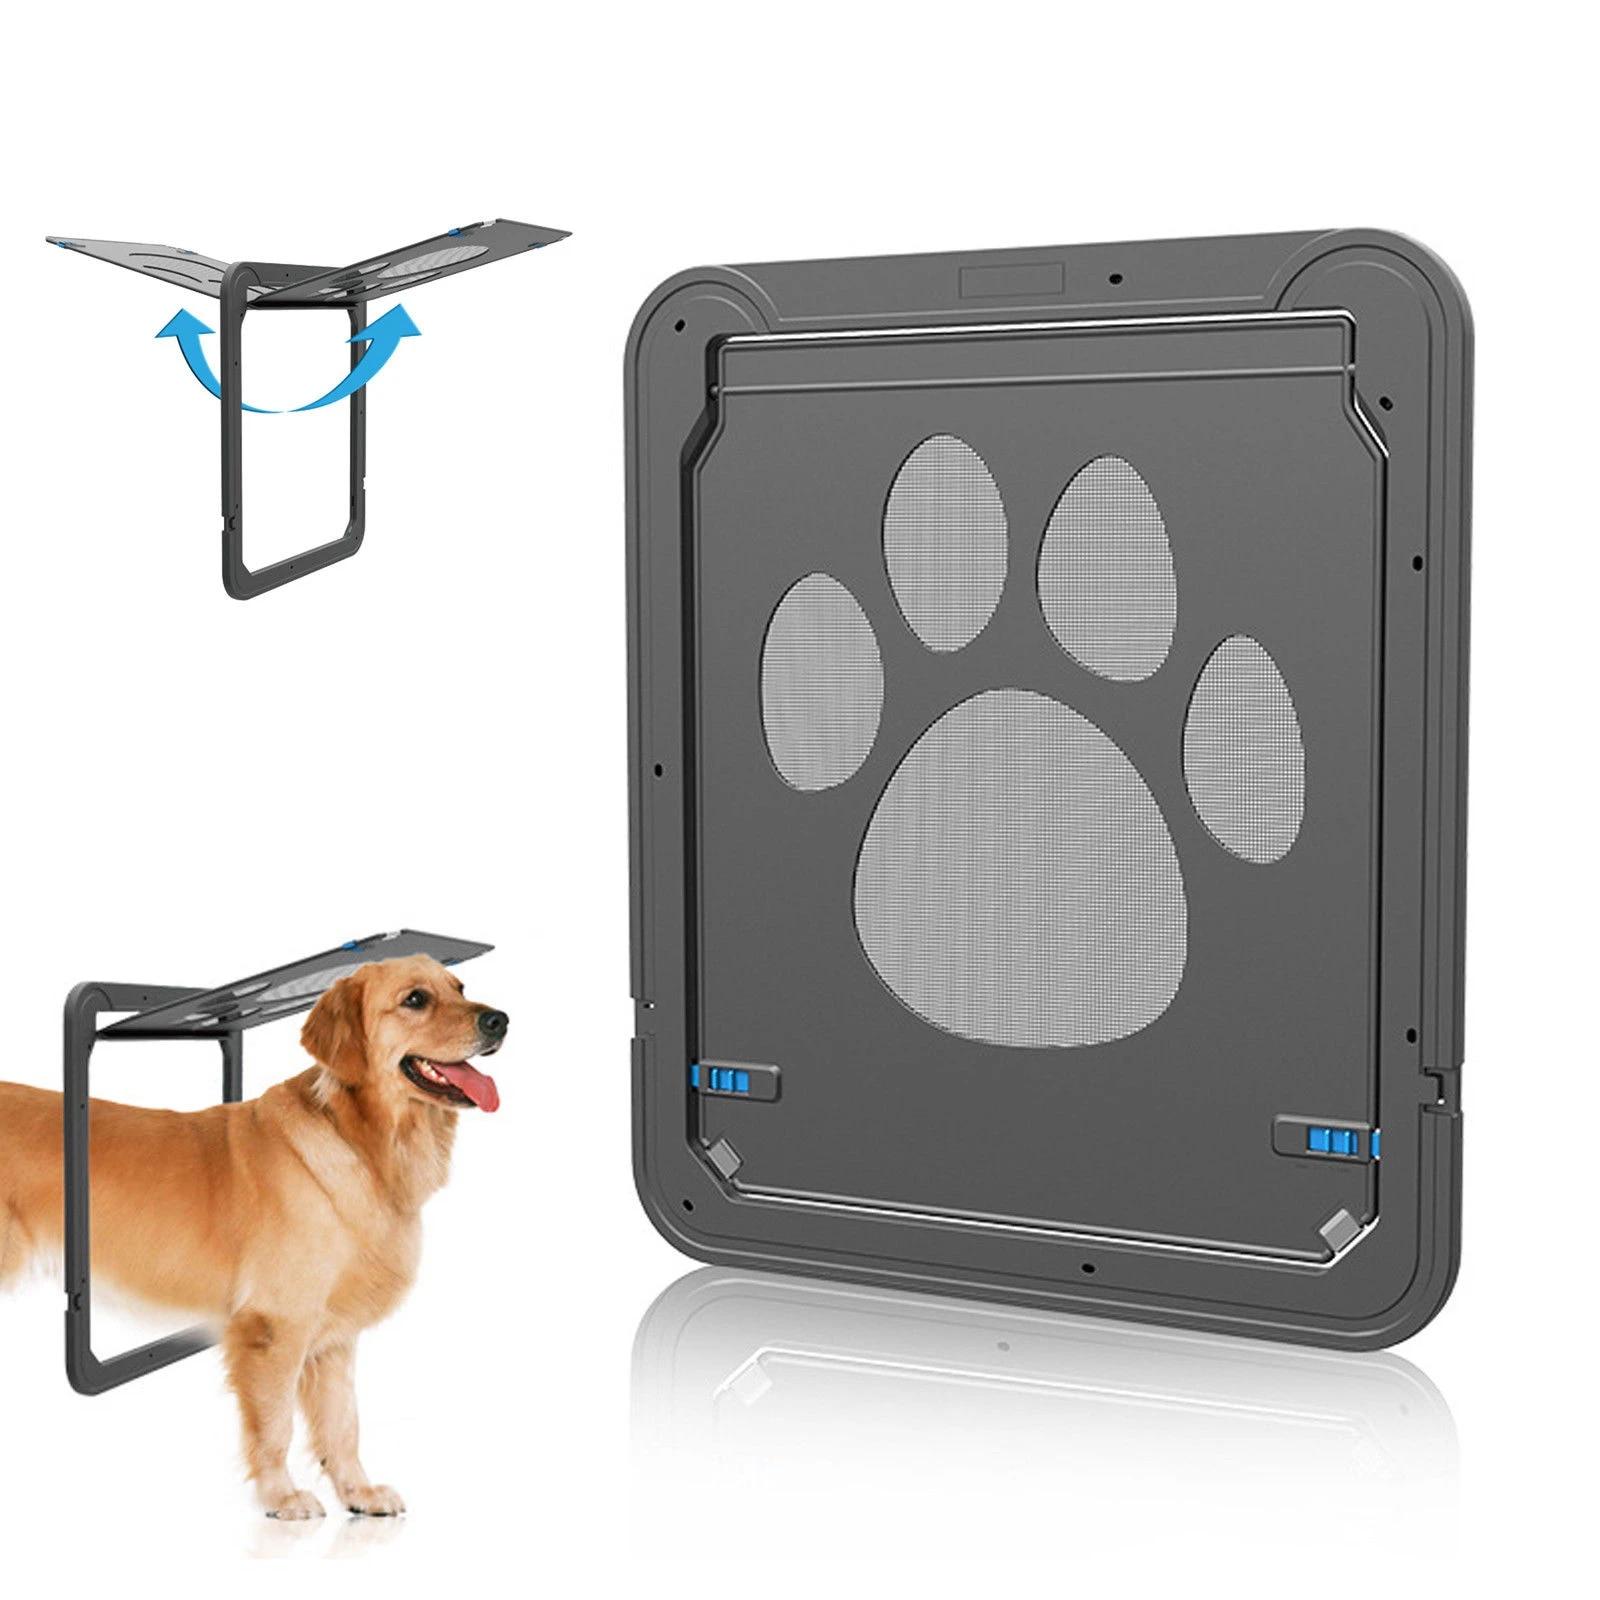 pet screen door dog cat automatic magnetic lockable flap net gate patio window